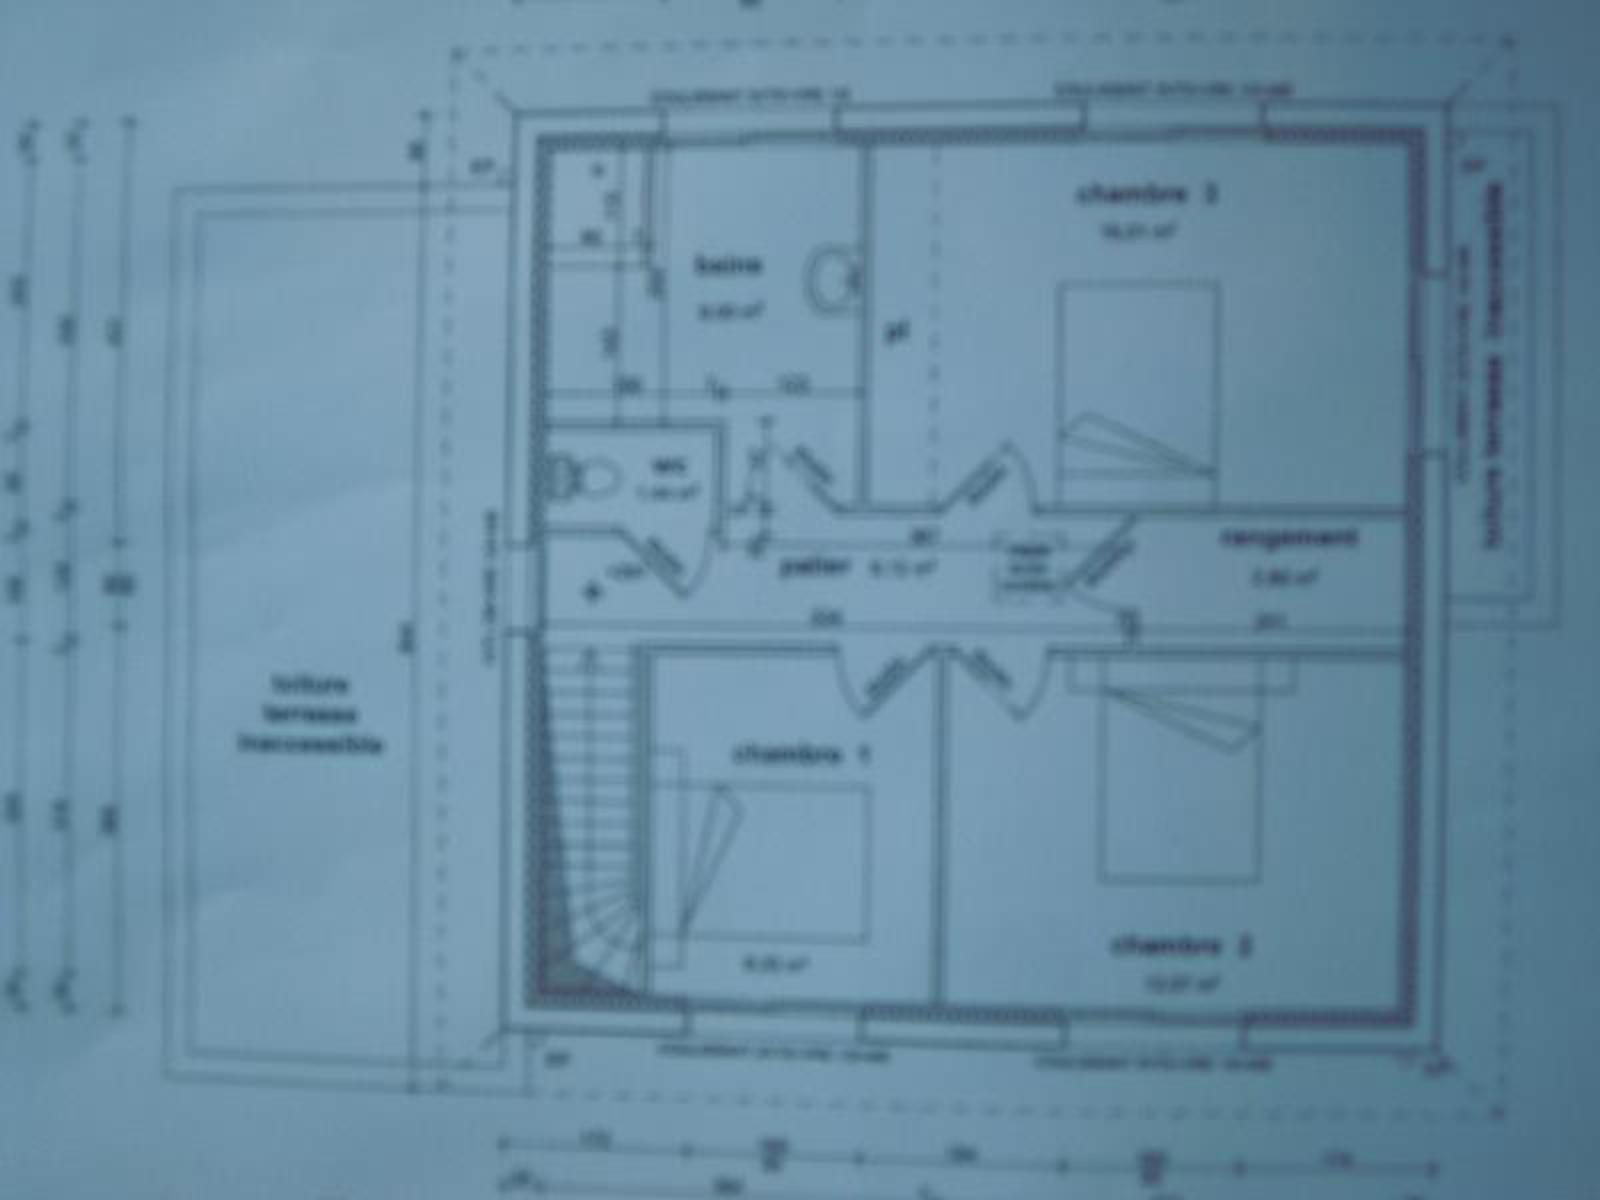 Saint-Martin-Boulogne France  City new picture : Vente SAINT MARTIN BOULOGNE, Maison neuve de 120 m² 5 pièces ...